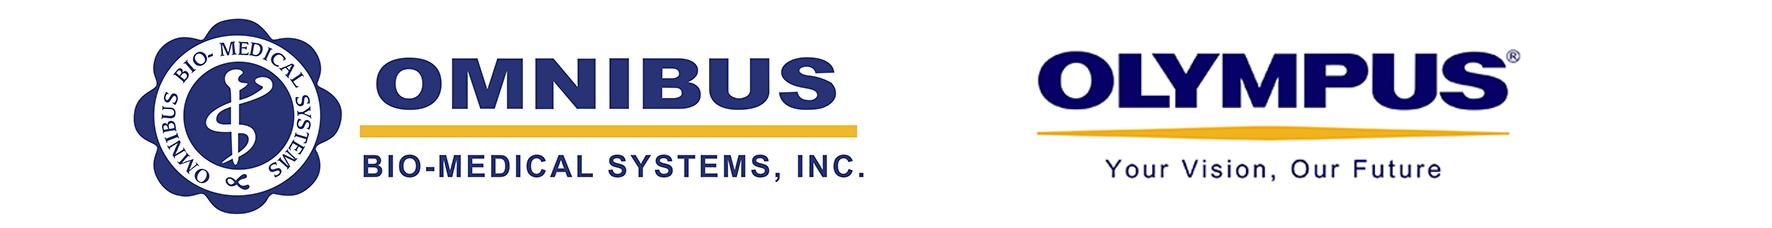 Omnibus Logo.png